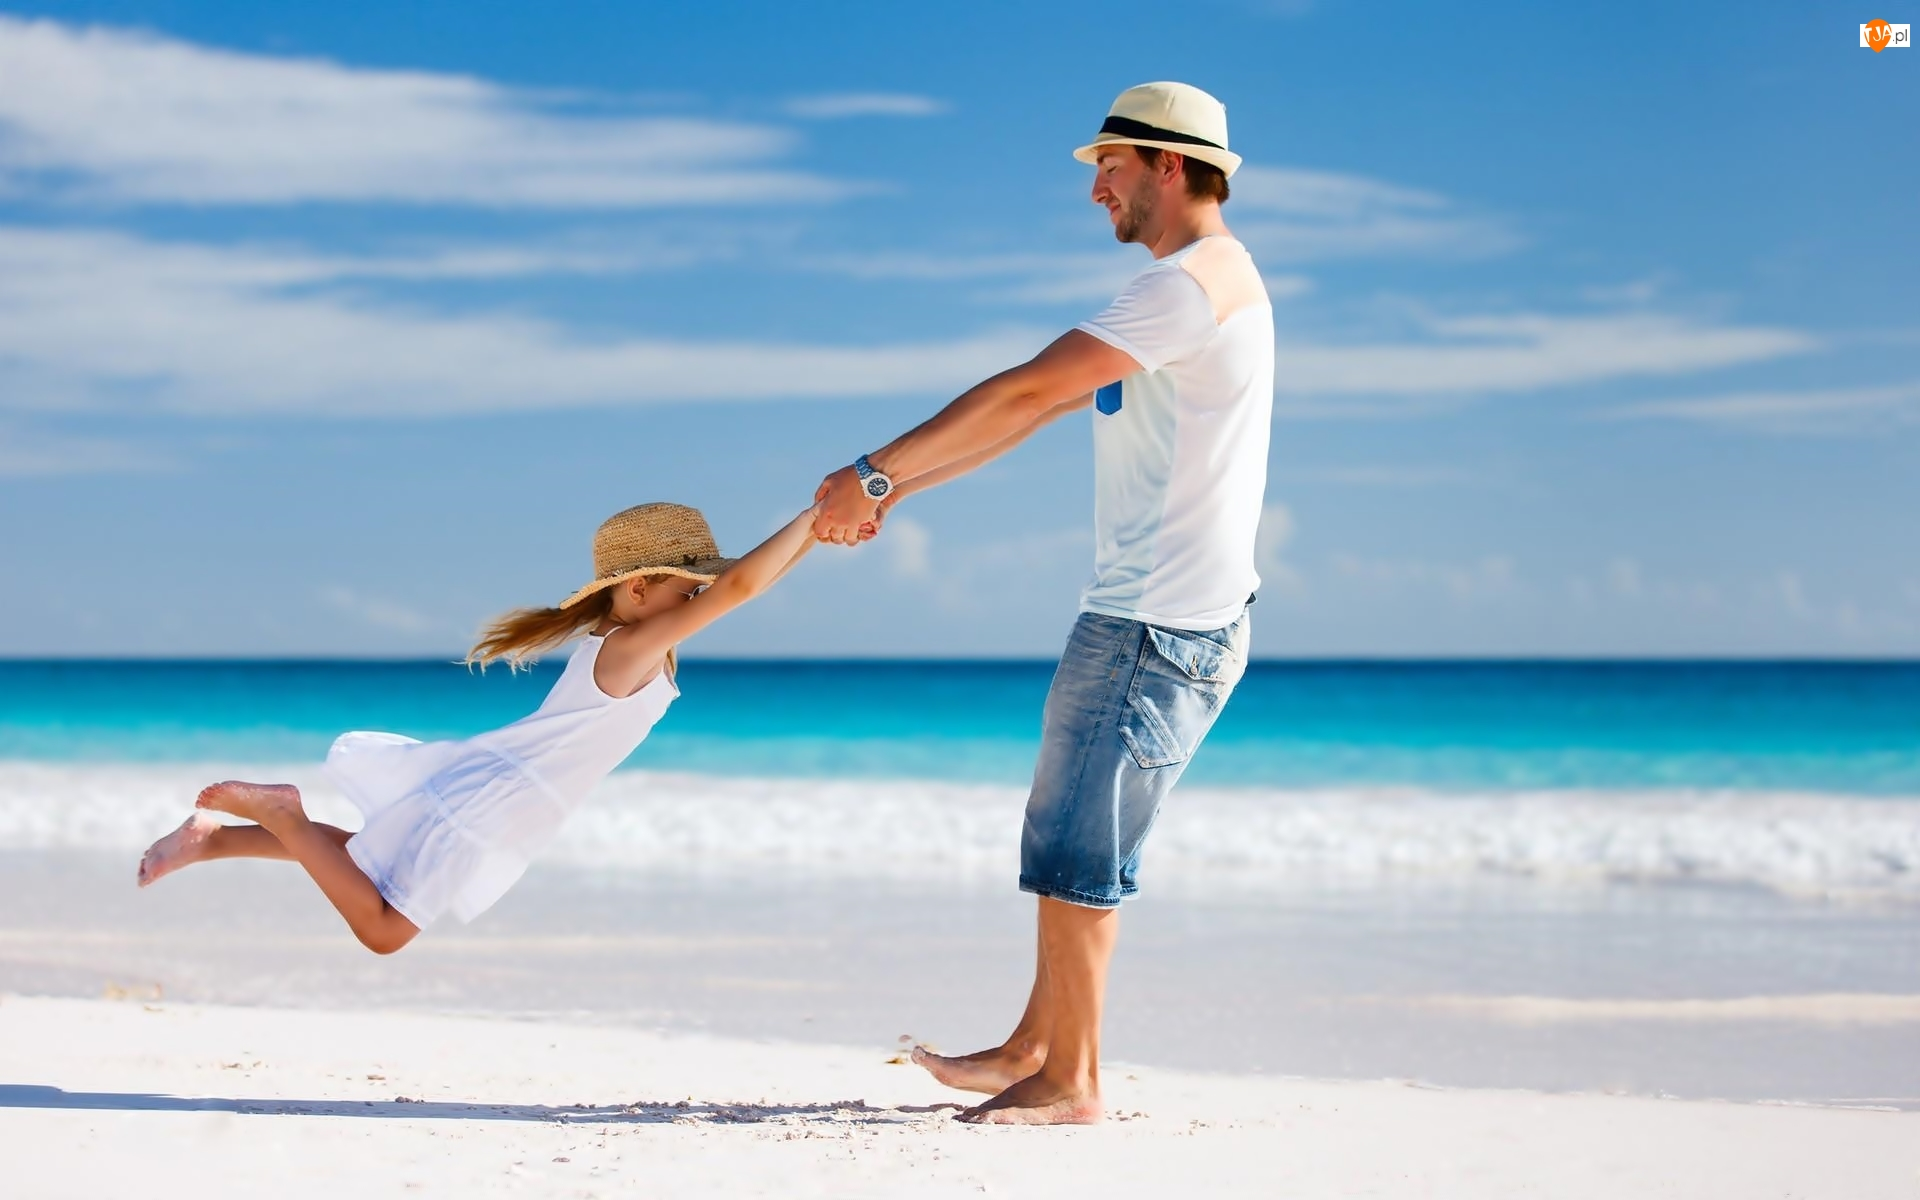 Córka, Morze, Ojciec, Zabawa